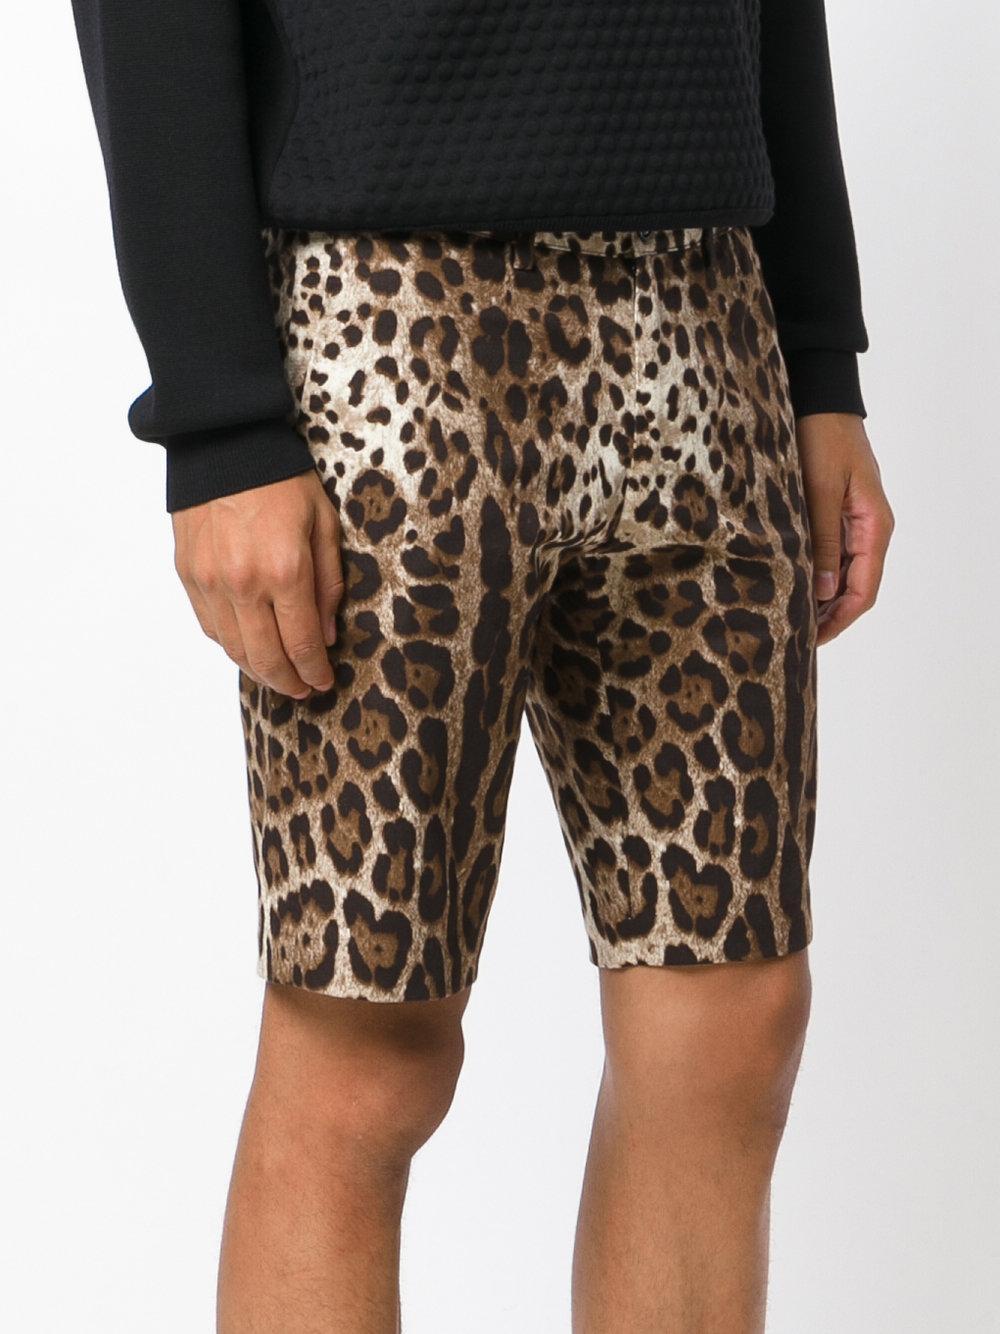 Find great deals on eBay for Leopard Shorts Men in Shorts for Men. Shop with confidence. Find great deals on eBay for Leopard Shorts Men in Shorts for Men. NEW Men Tiger Leopard Print Fleece Shorts Elastic Waist Drawstrings Sizes L-3XL. $ Buy .